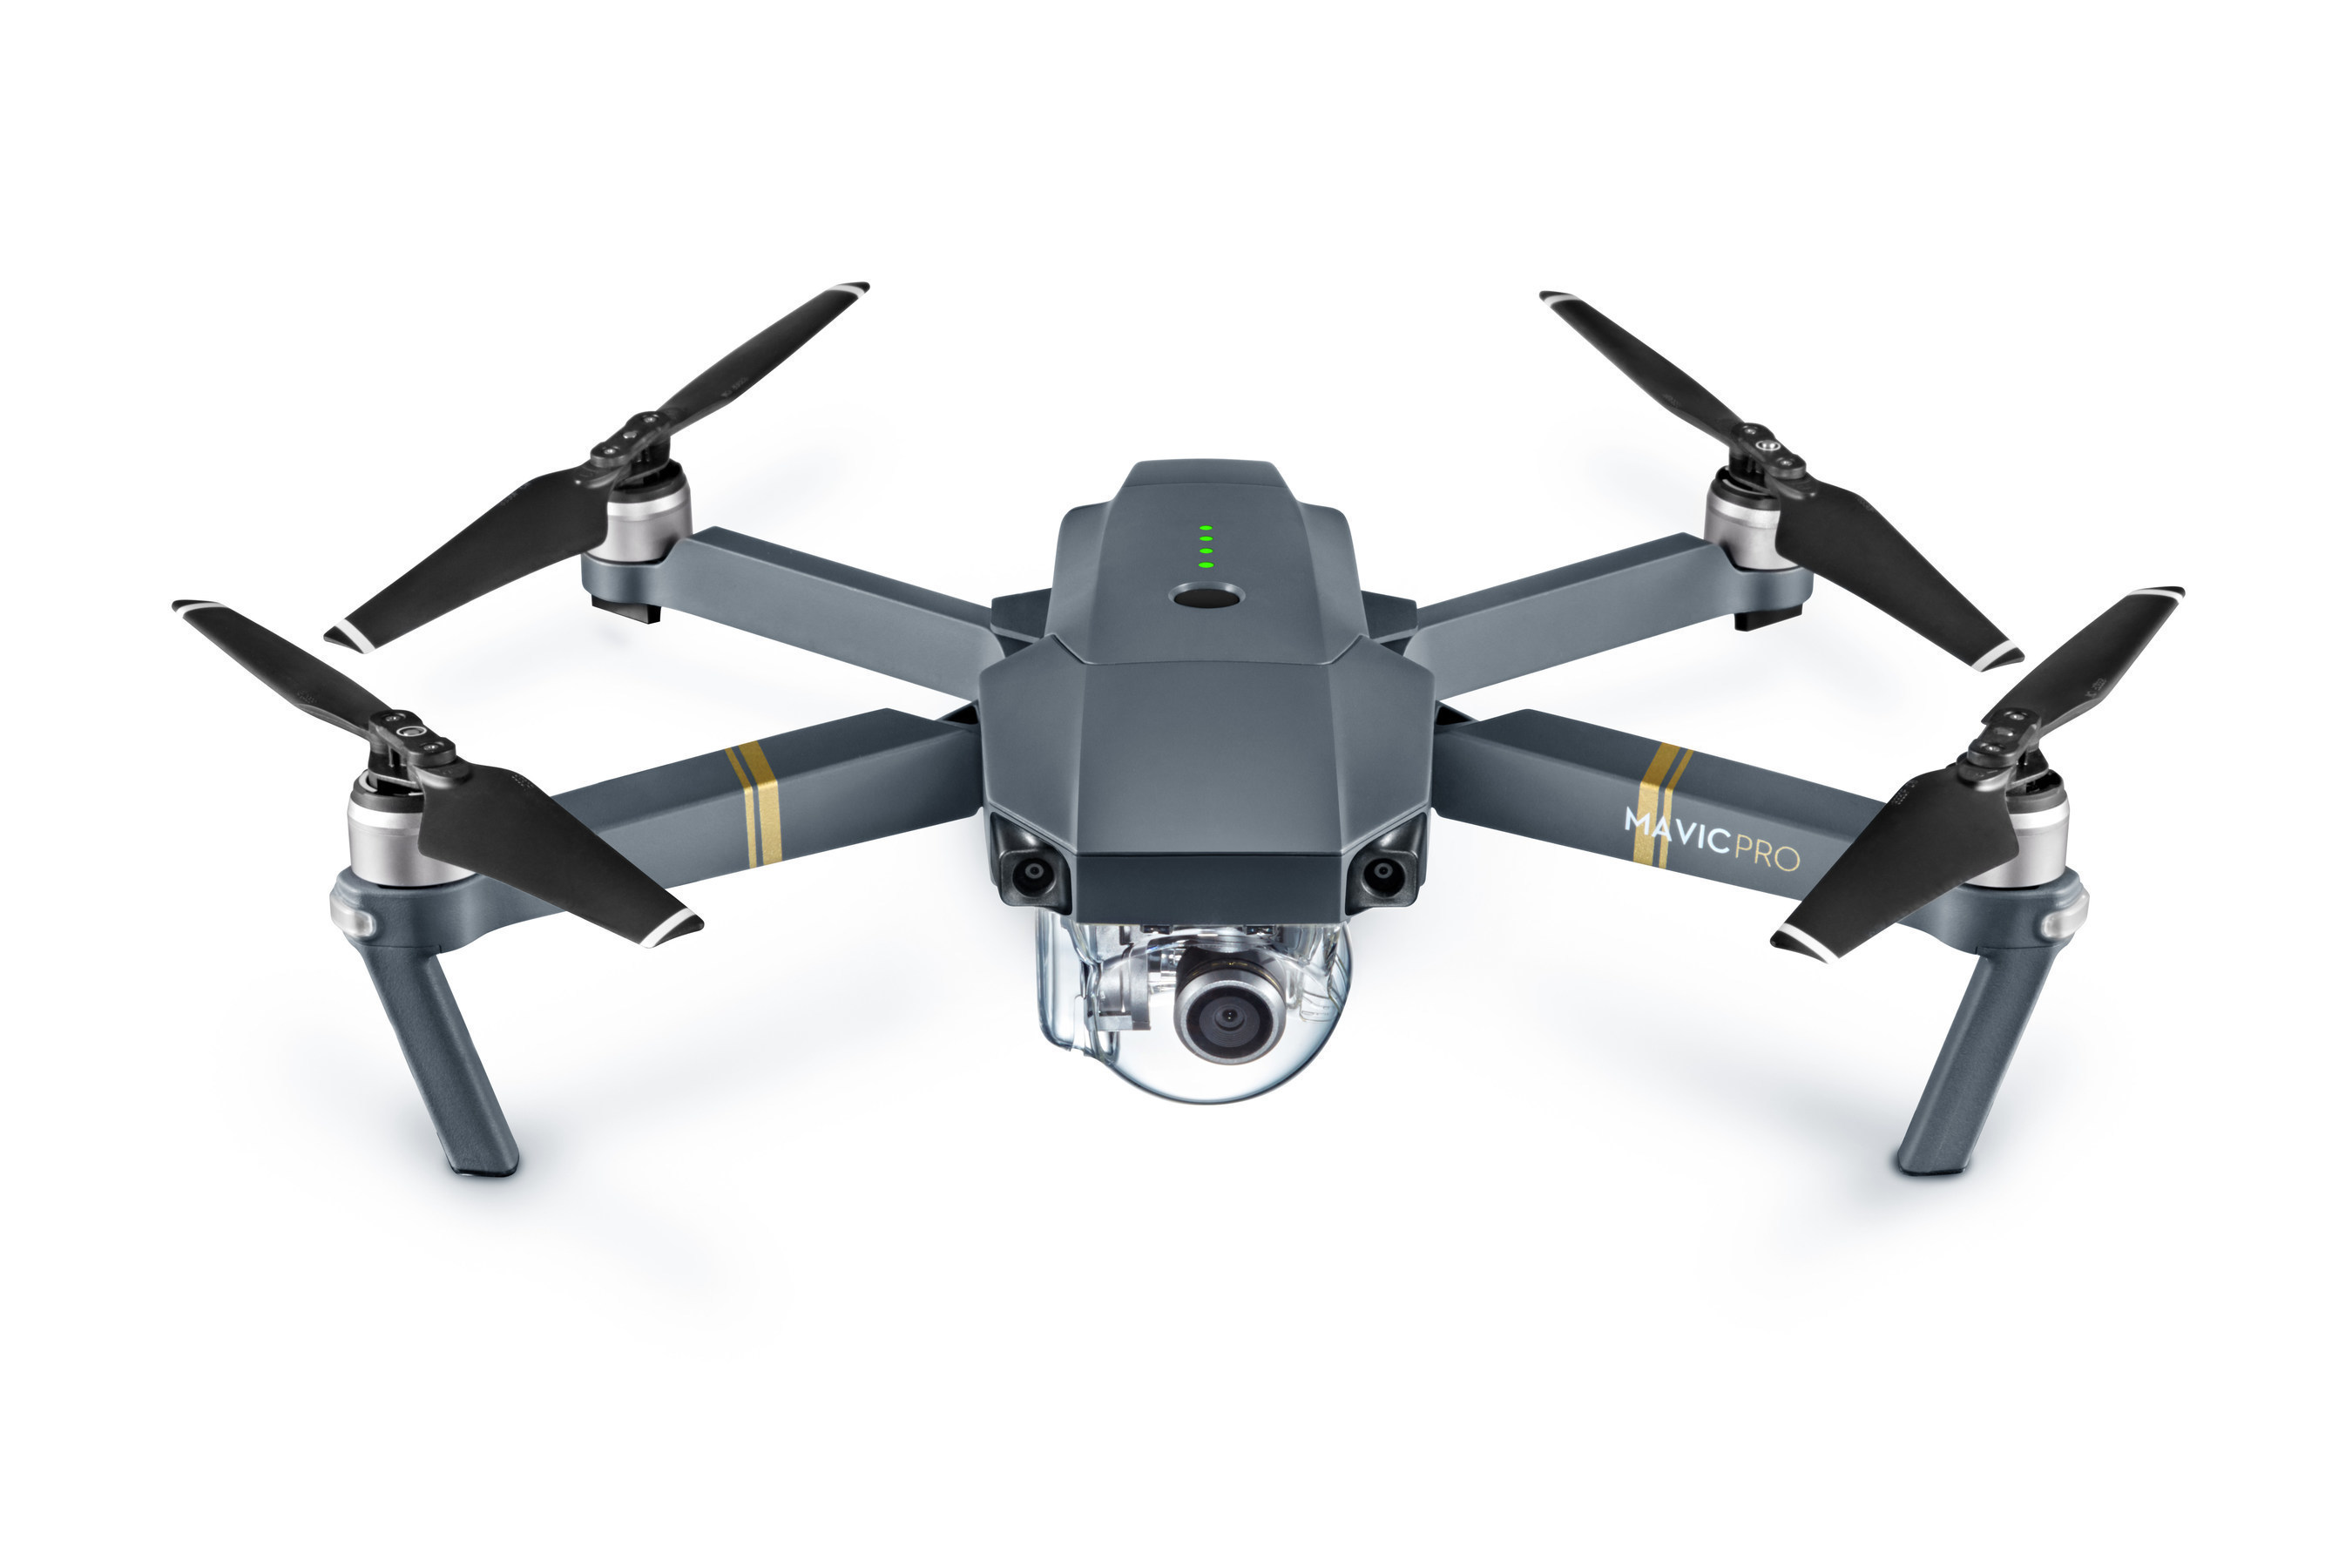 DJI Revolutionizes Personal Flight With New Mavic Pro Drone